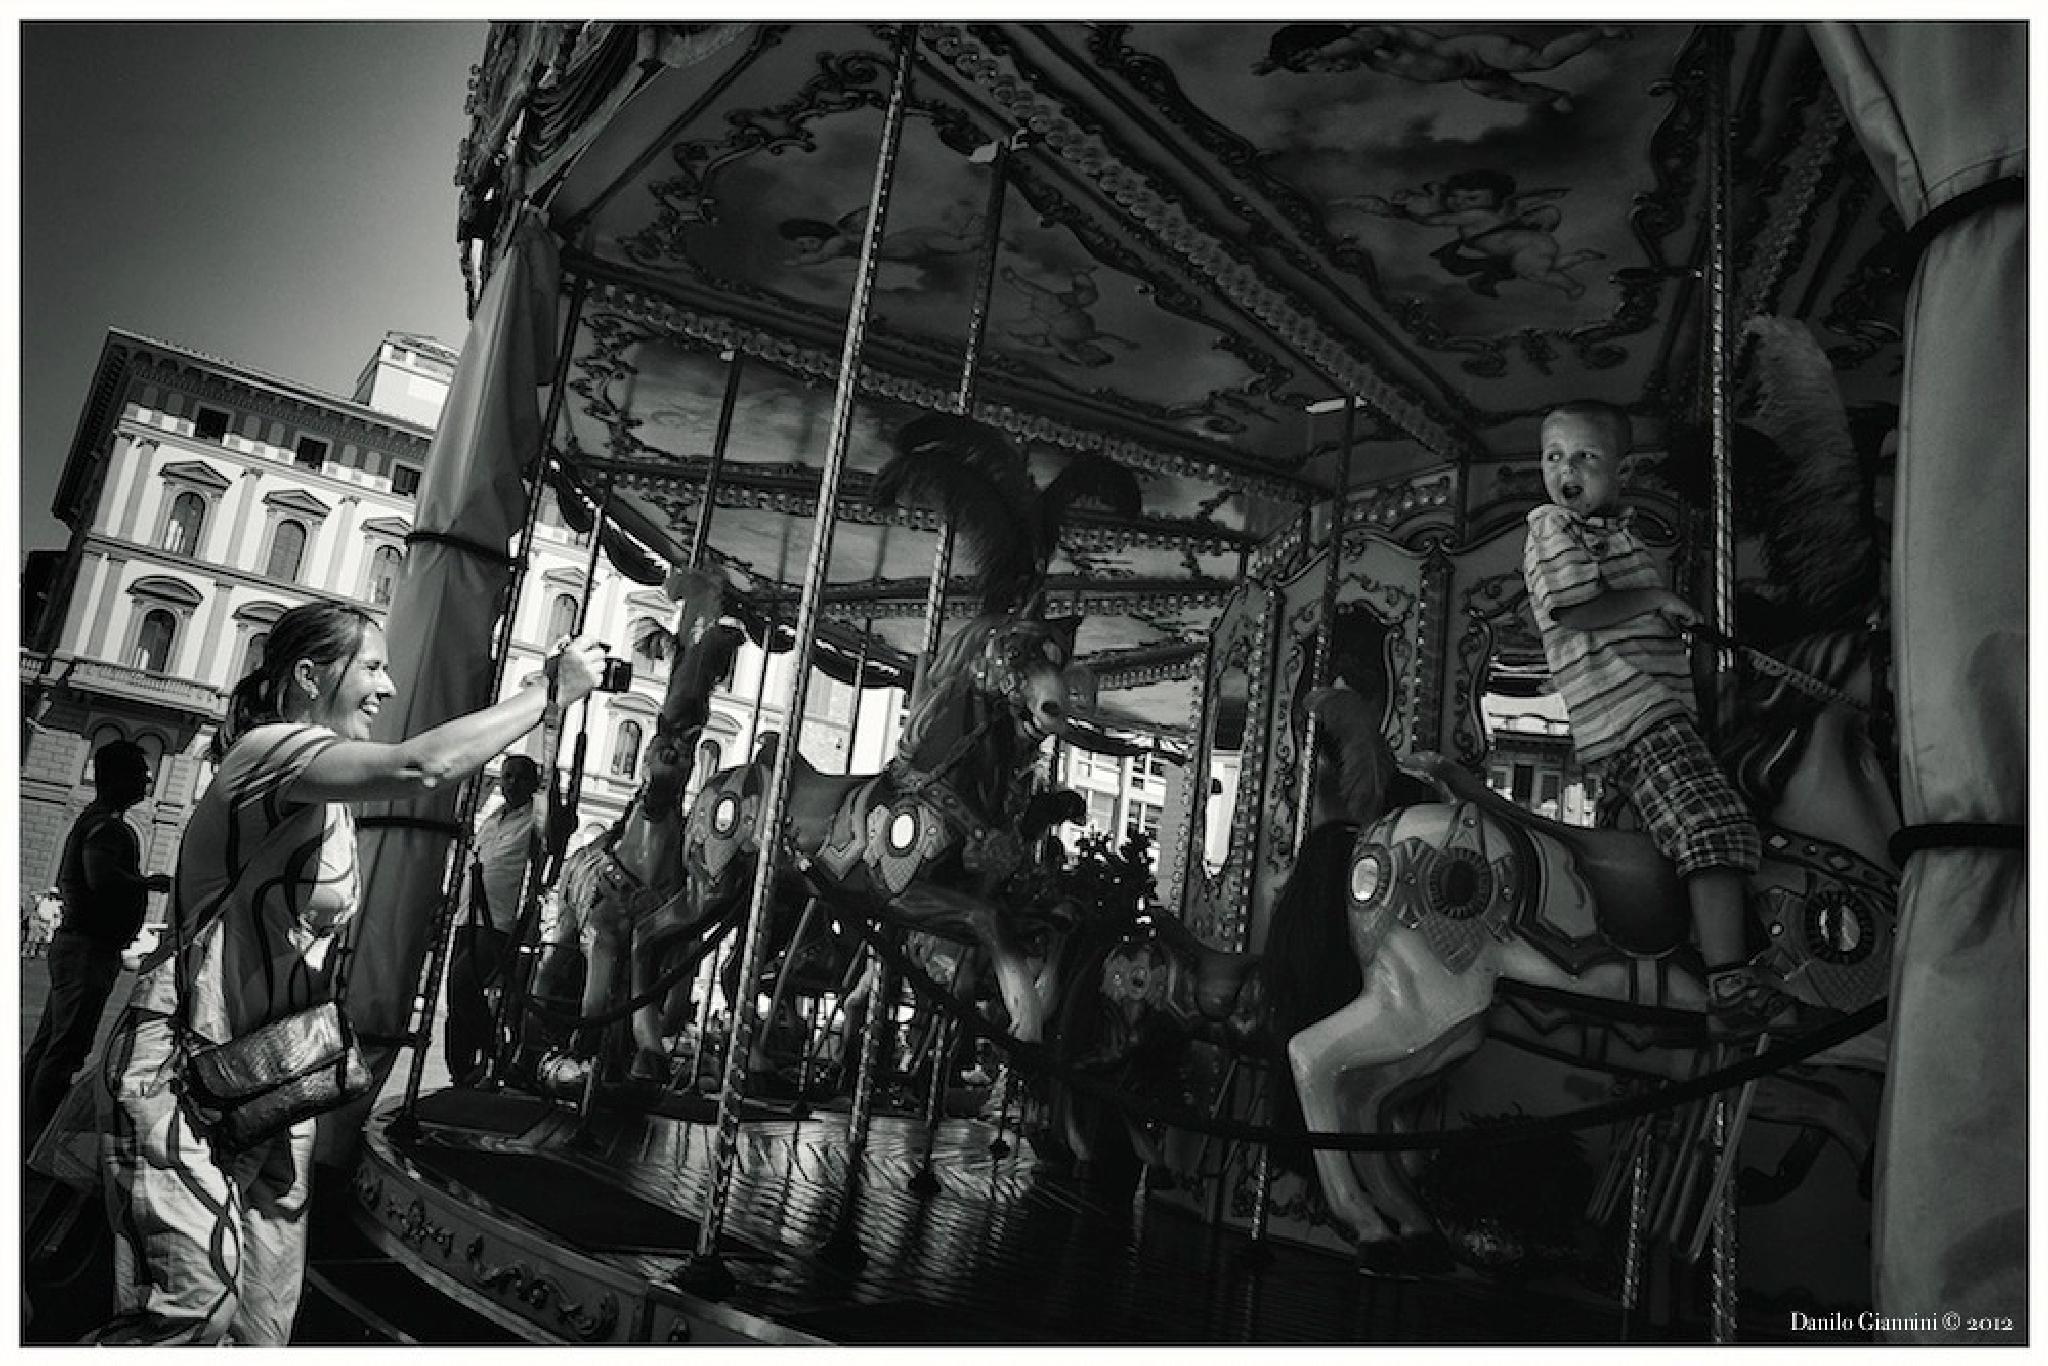 carousell by Danilo Giannini